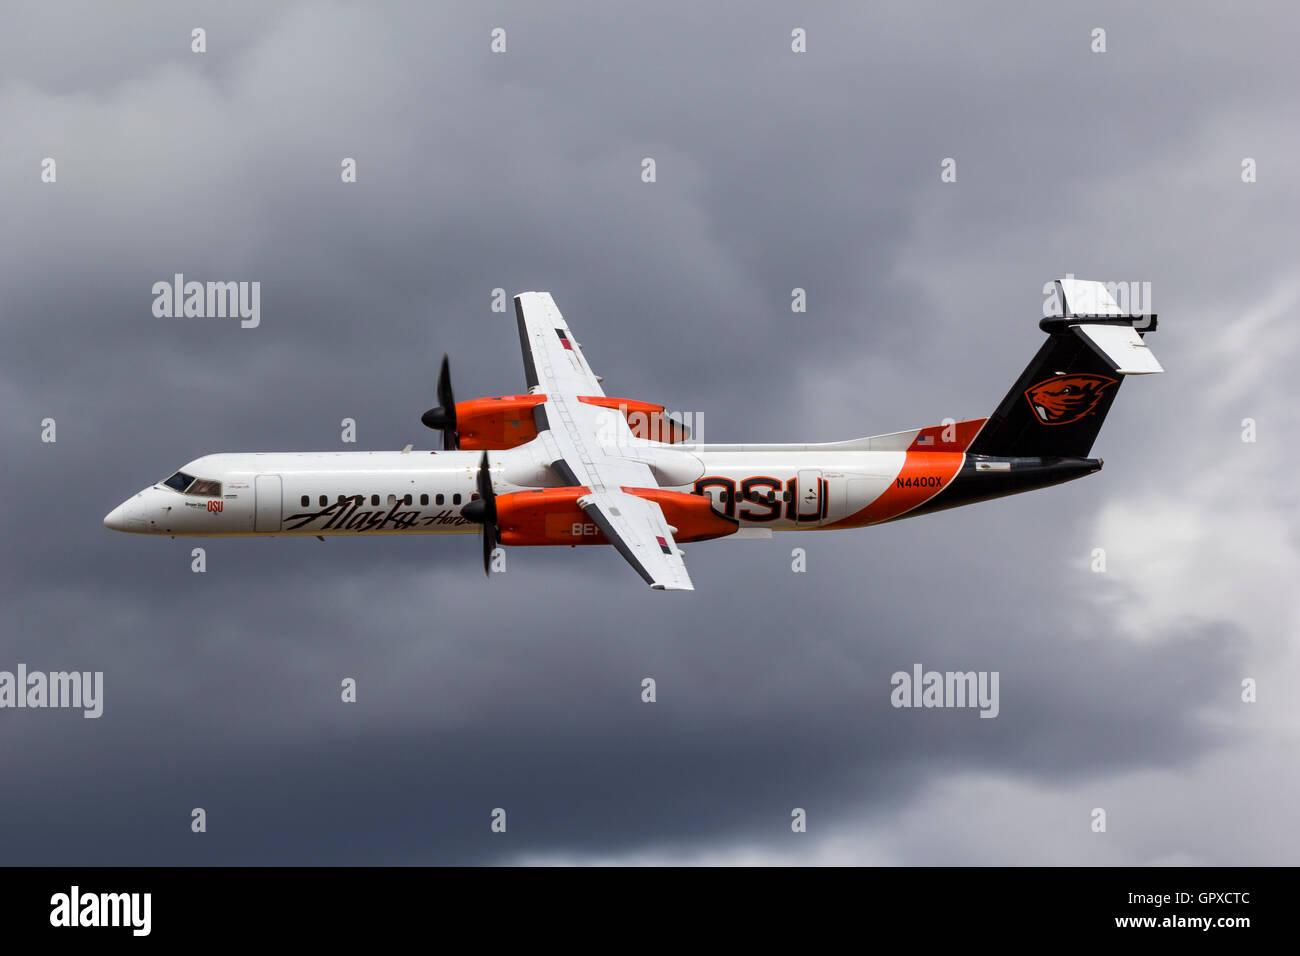 Alaska Airlines, Horizon Air, Bombardier Dash 8-Q402   turboprop (N440QX) in Oregon State University Beavers scheme. - Stock Image